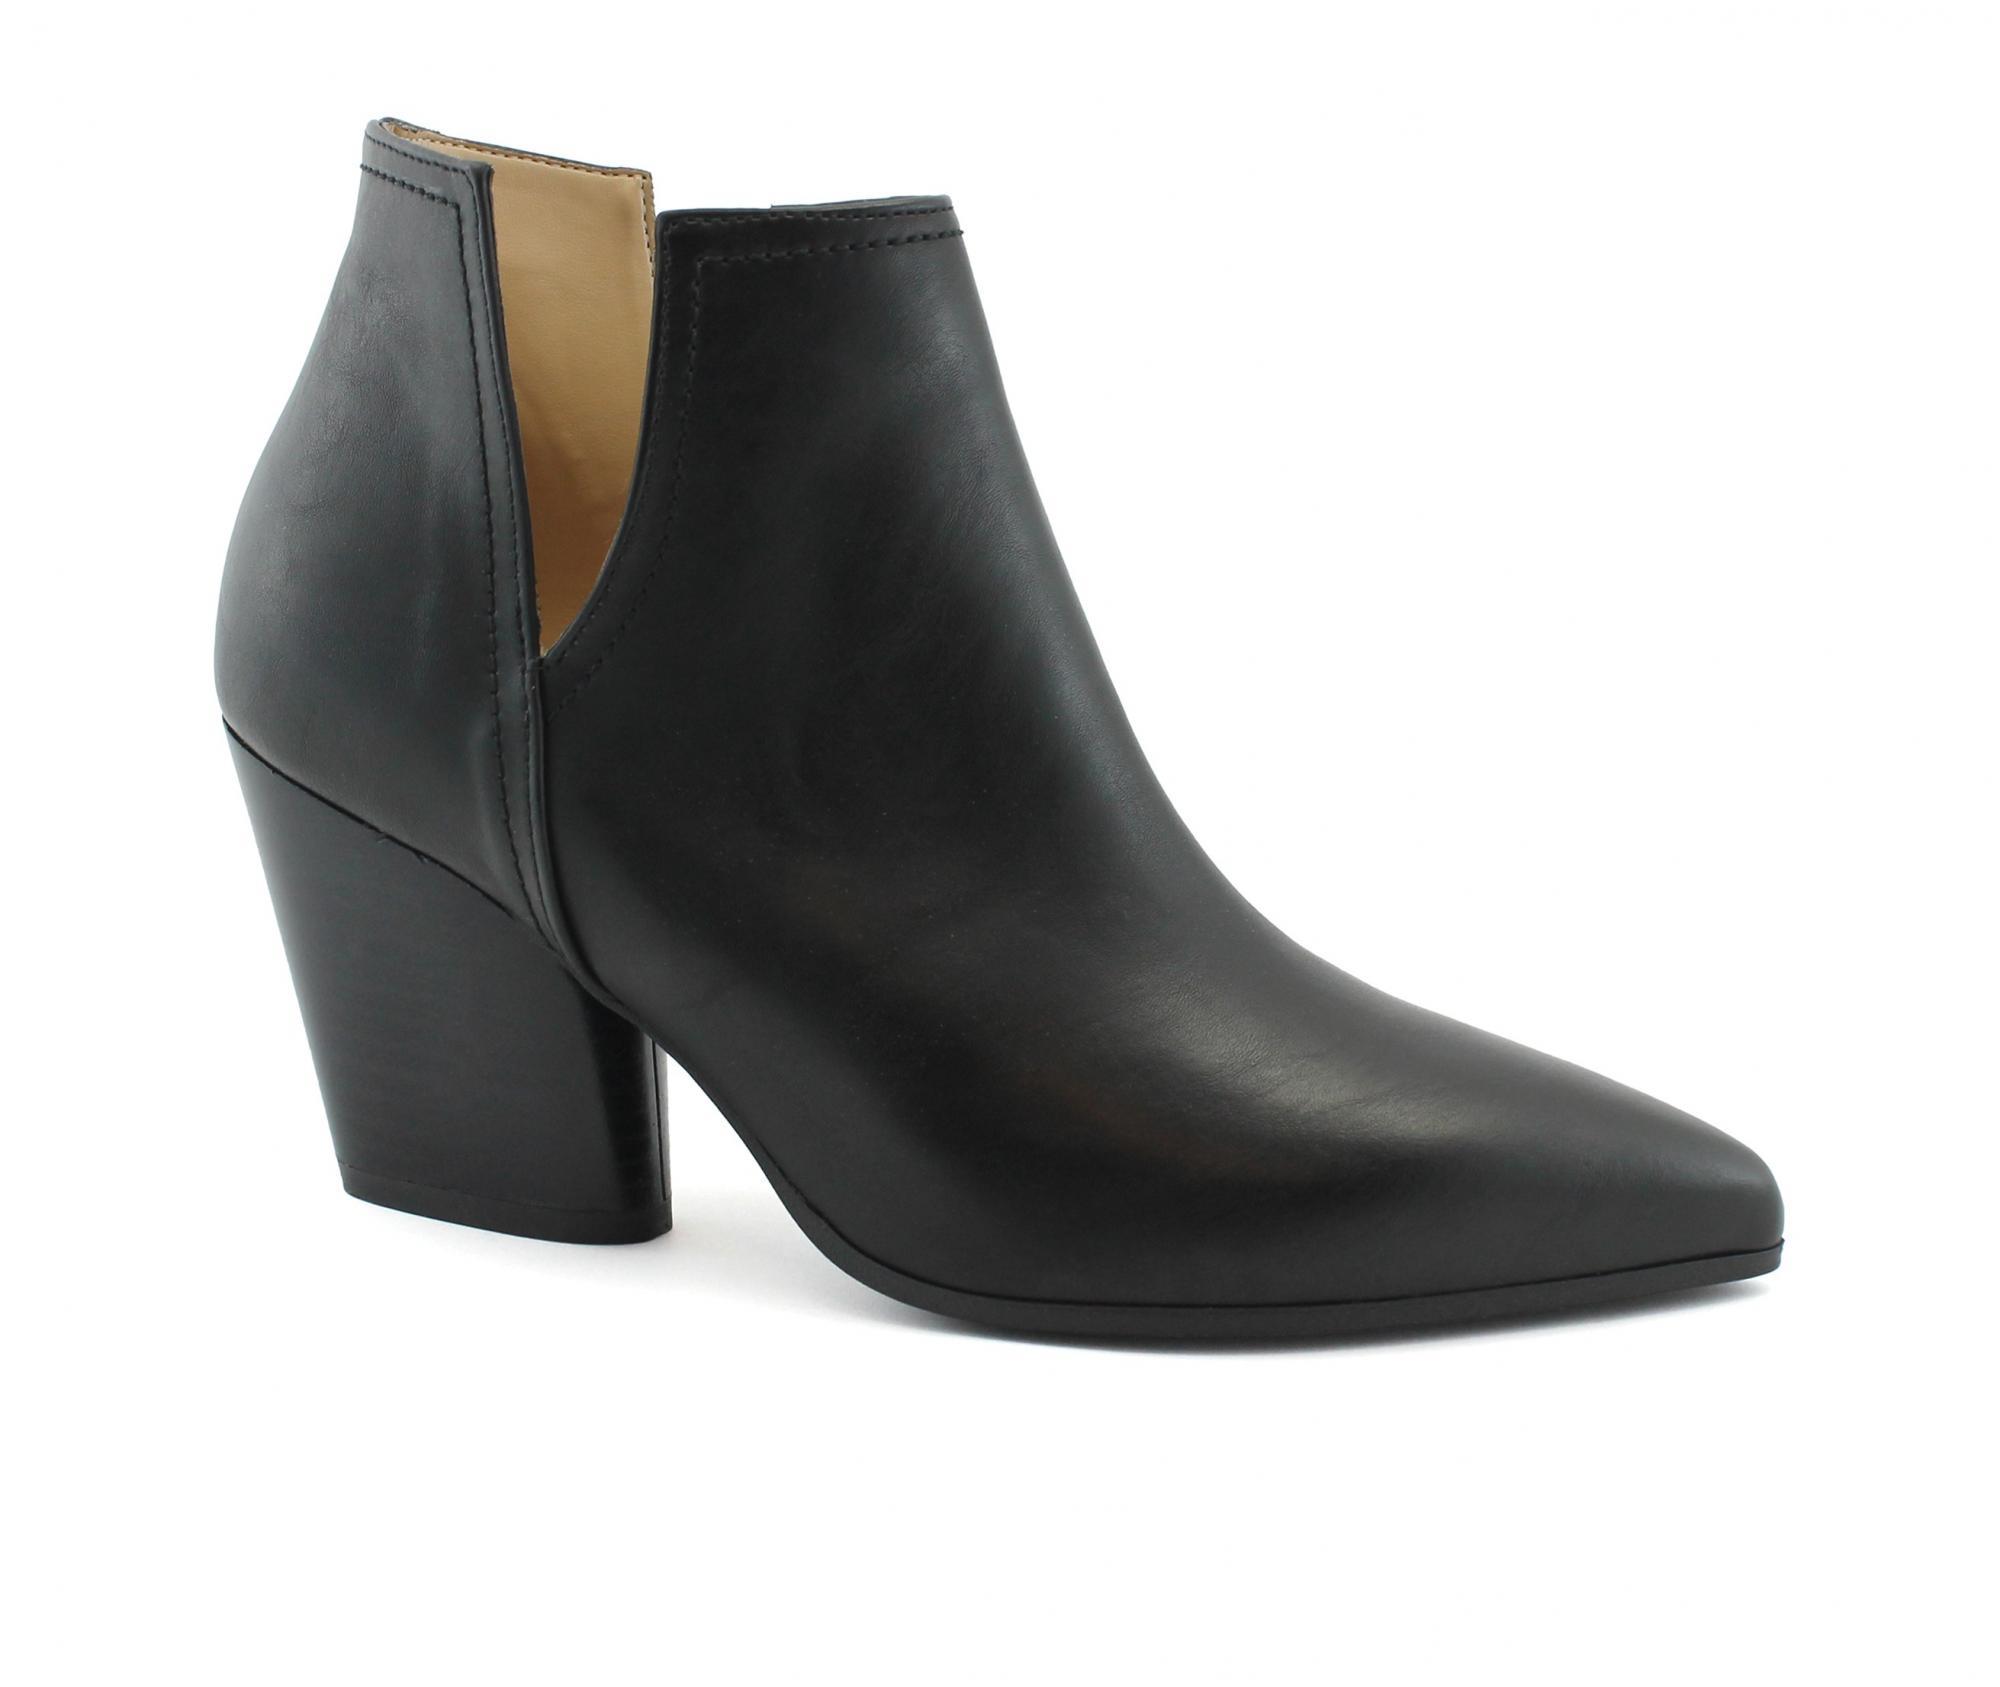 172eb924c22492 VSI Damenschuhe Mikrofaser Stiefeletten vegane Schuhe Made in Italy -  VeganShoes.it